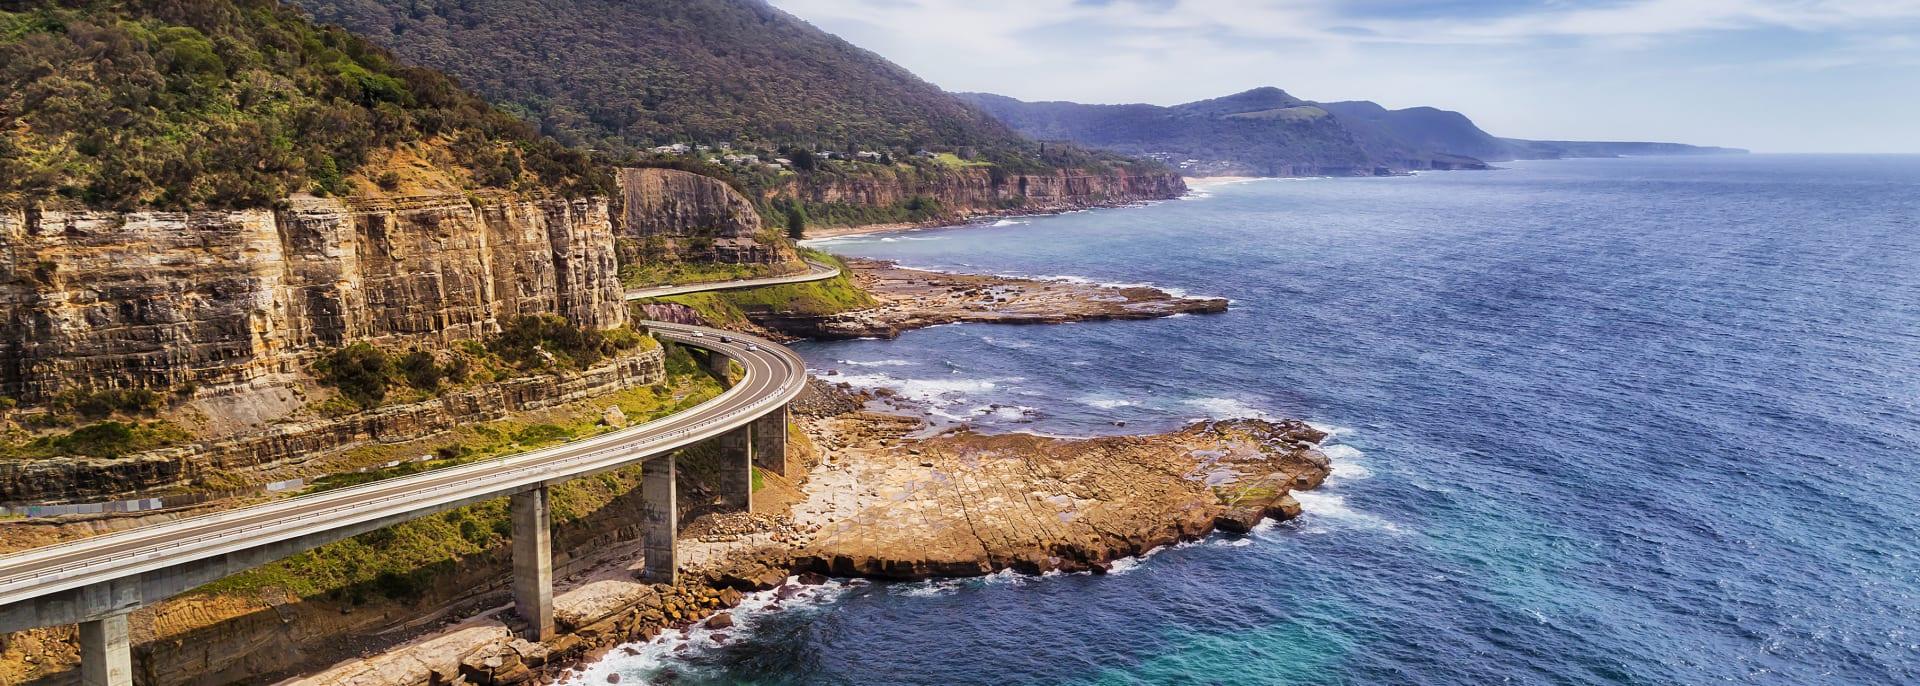 Sea Cliff Bridge, Australien